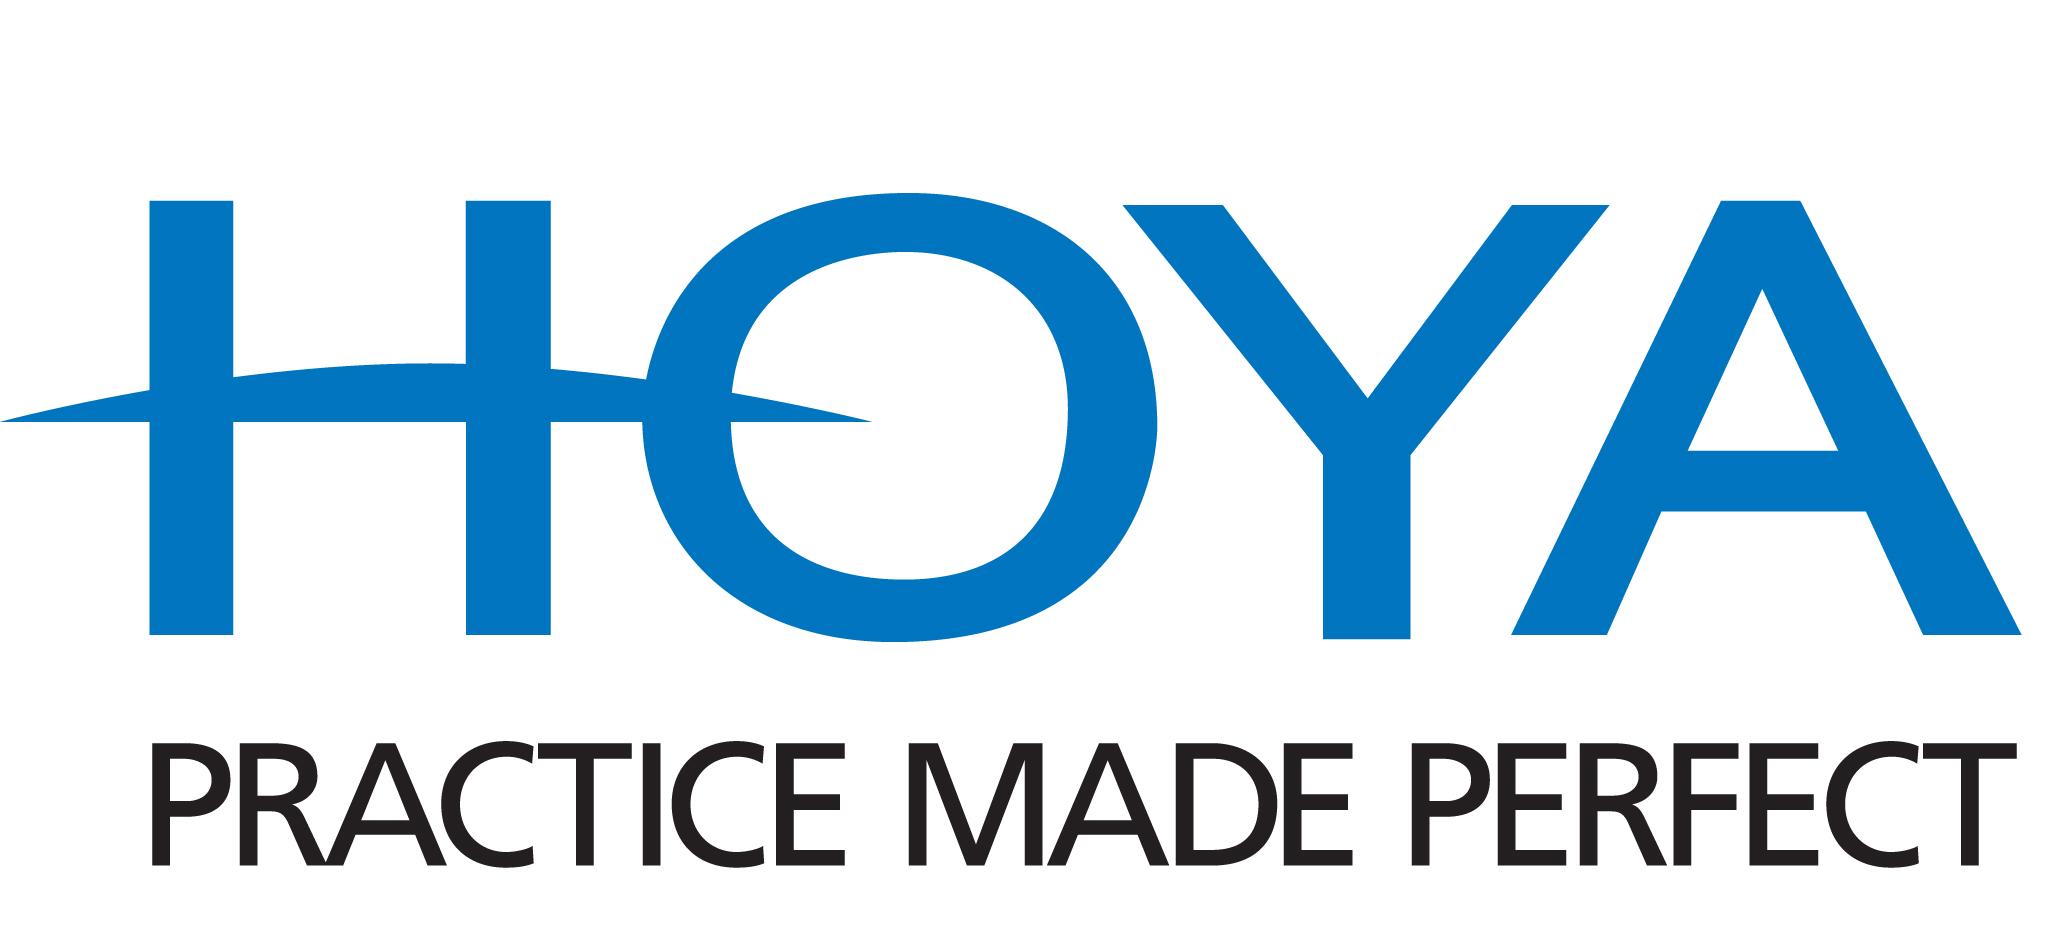 Hoya id single vision lens Single - gemebensblan - emeineseite